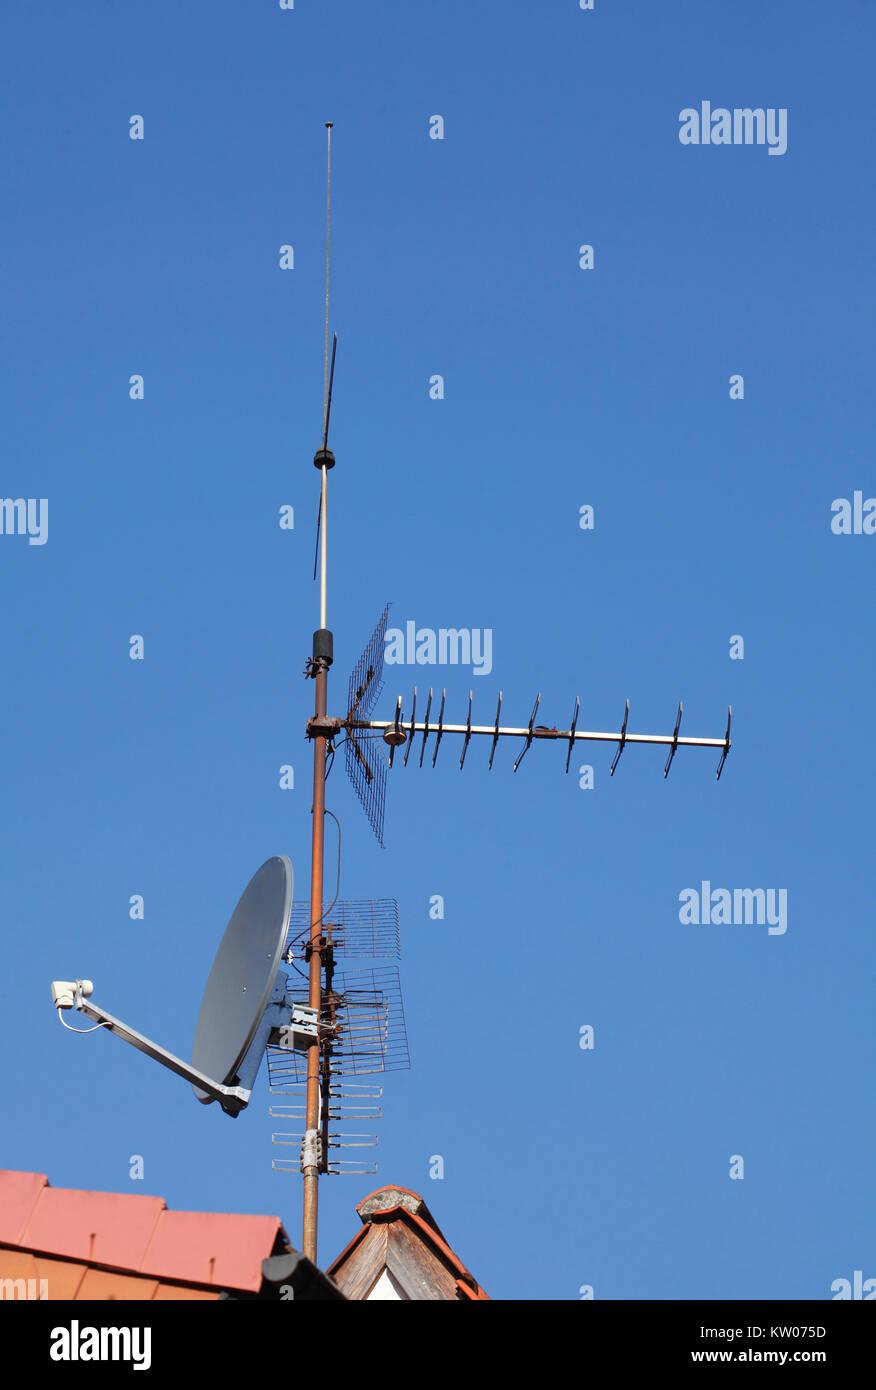 Satellite Bowls Stock Photos & Satellite Bowls Stock Images - Alamy